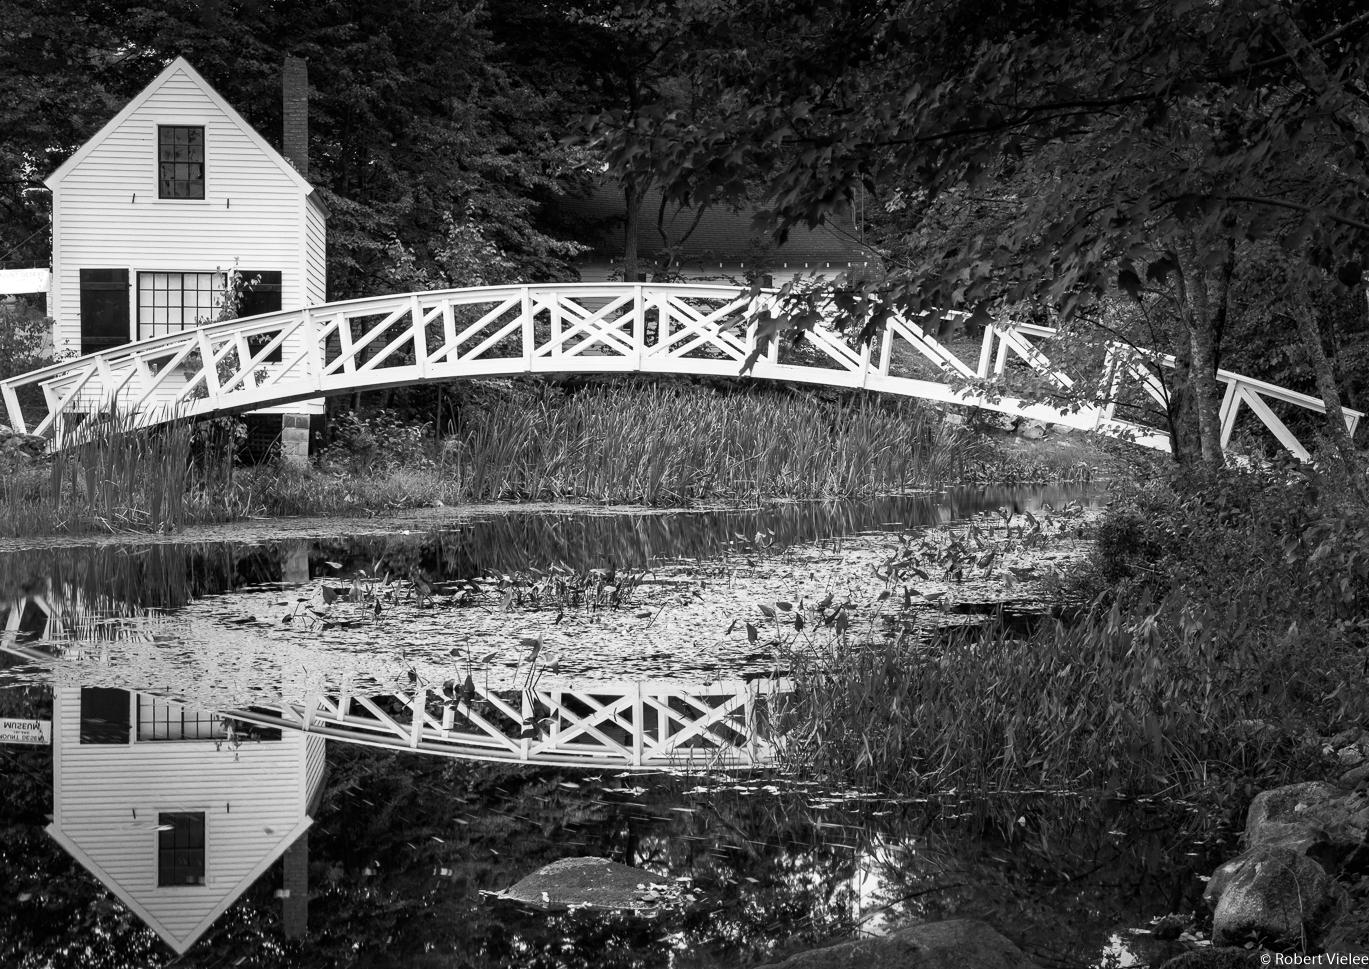 Footbridge Over Still Waters